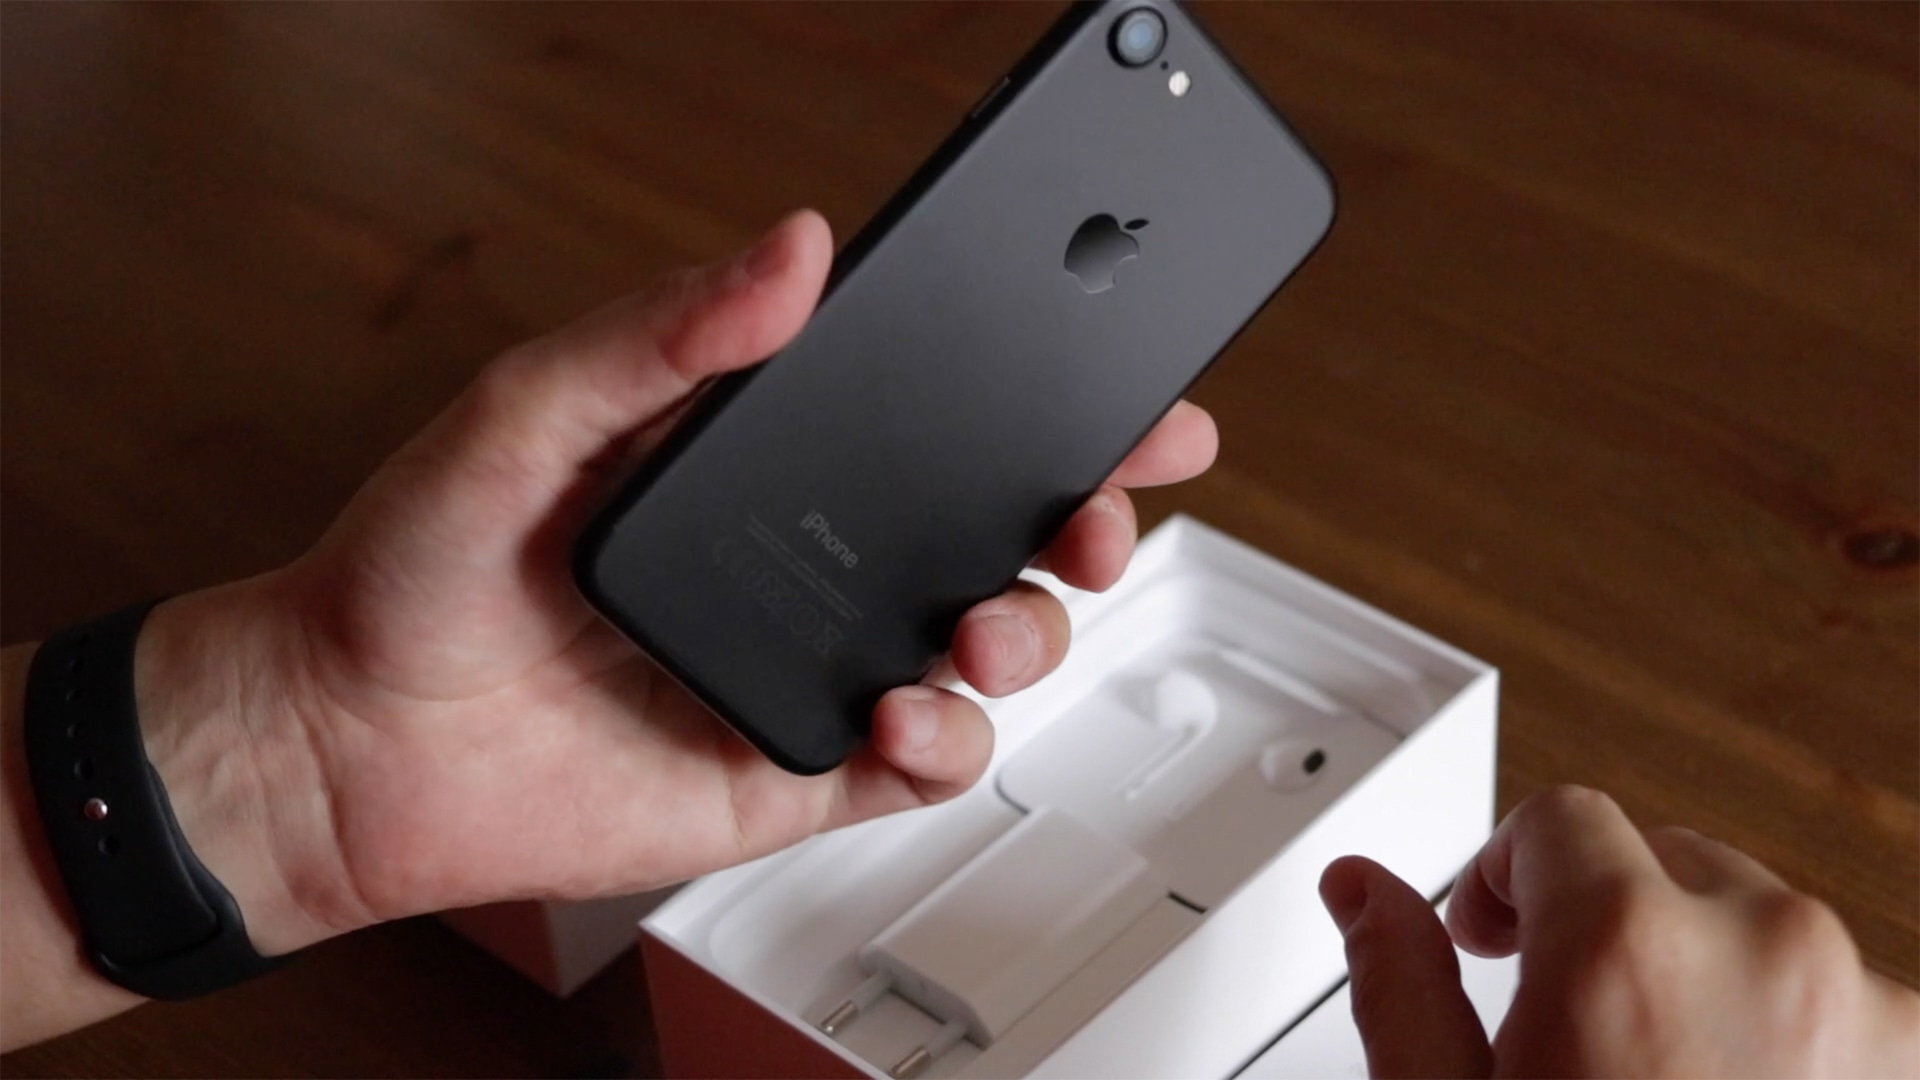 Unboxing do iPhone 7 preto matte